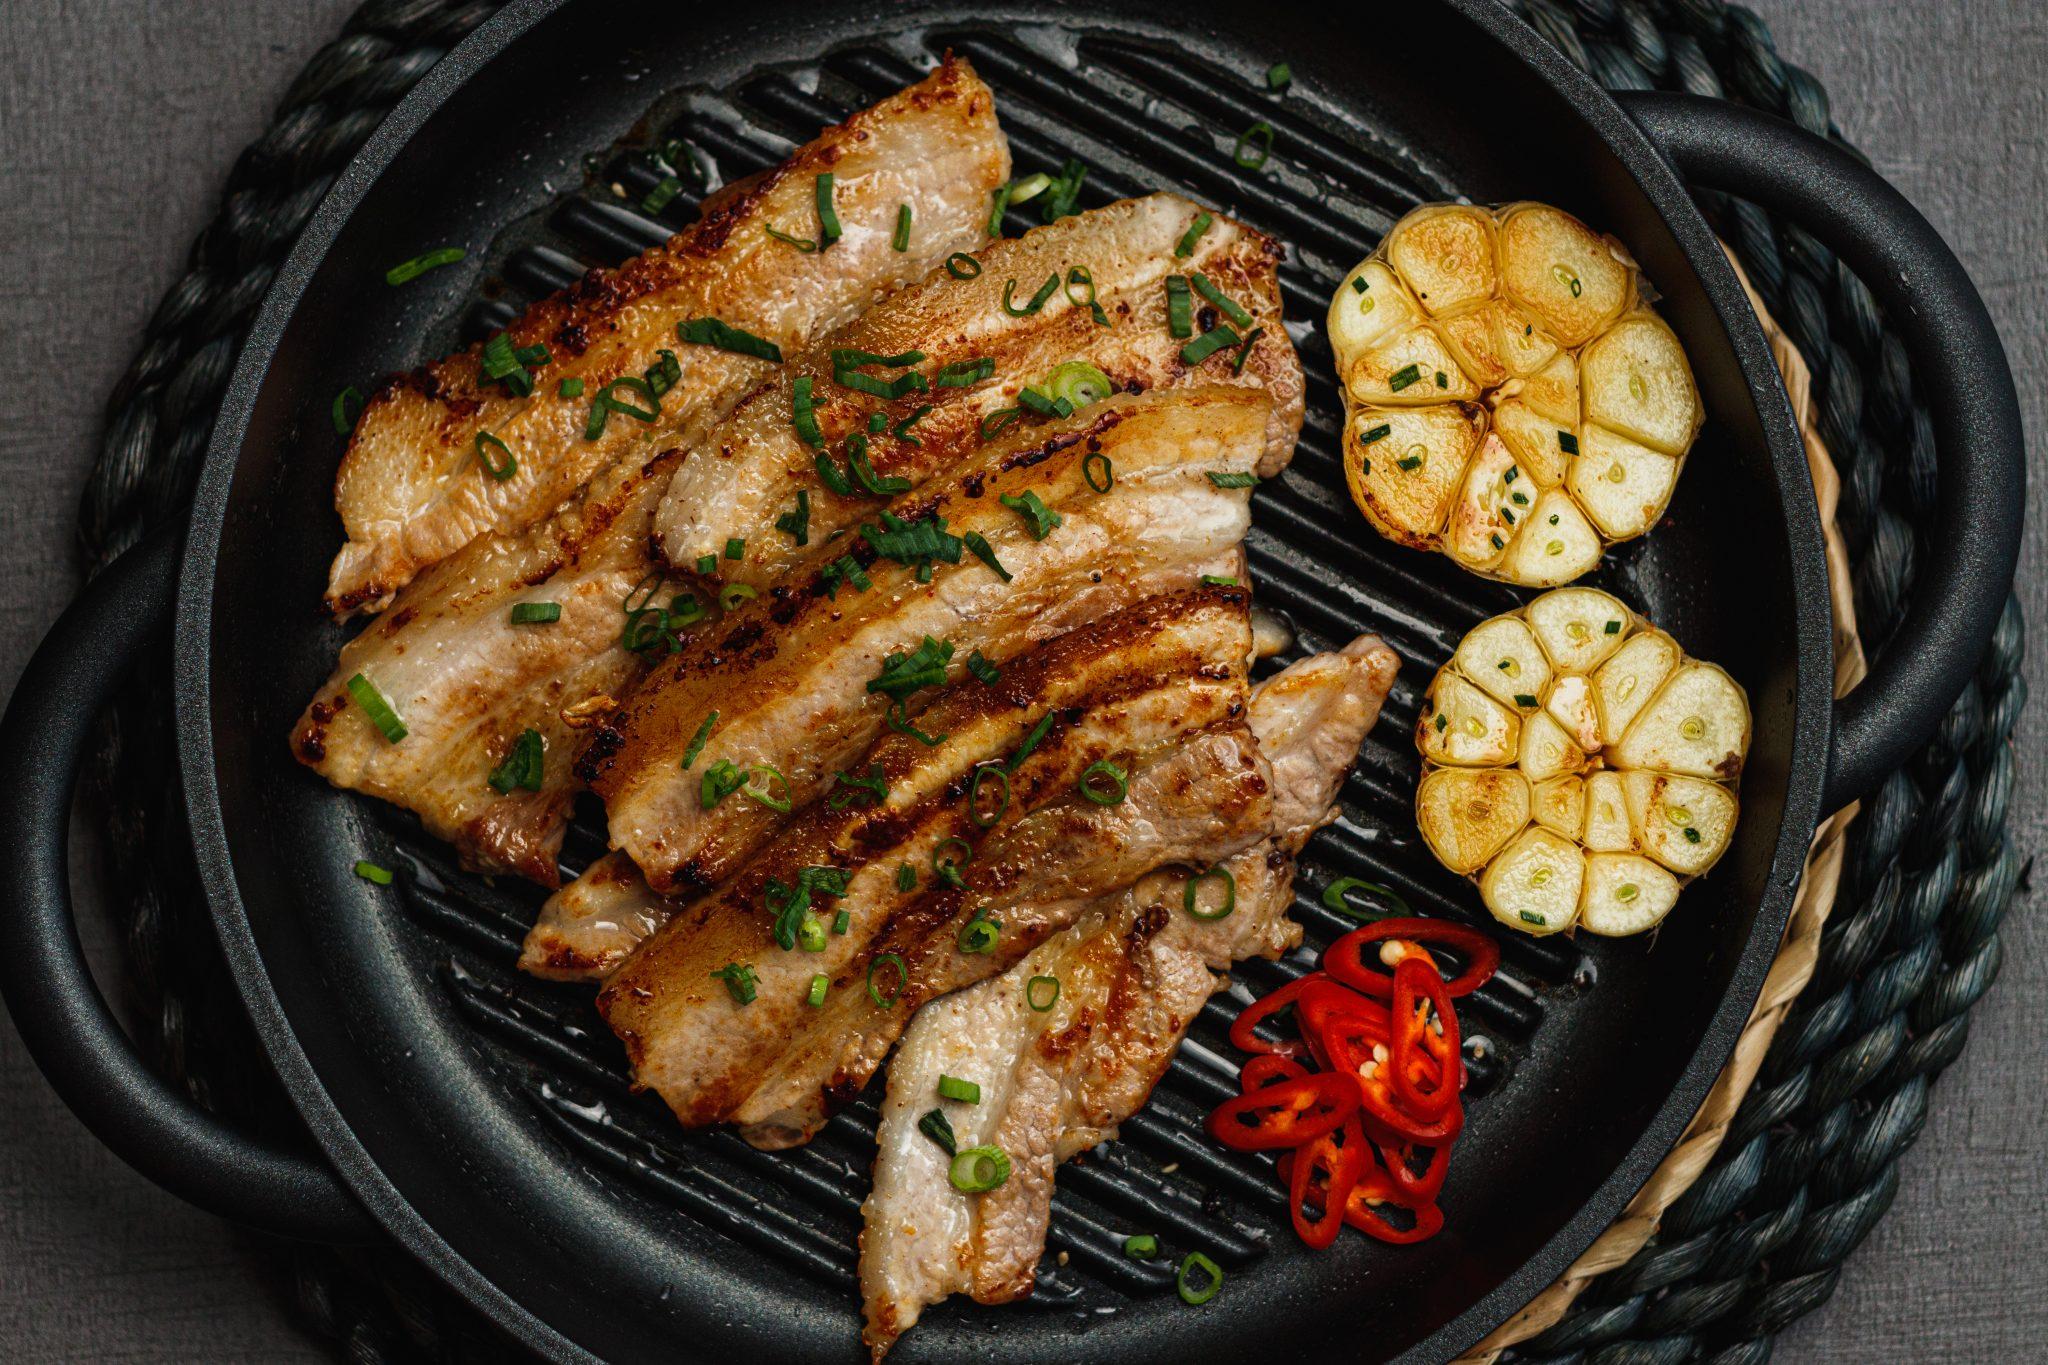 KOREAN STYLE PORK BELLY BBQ